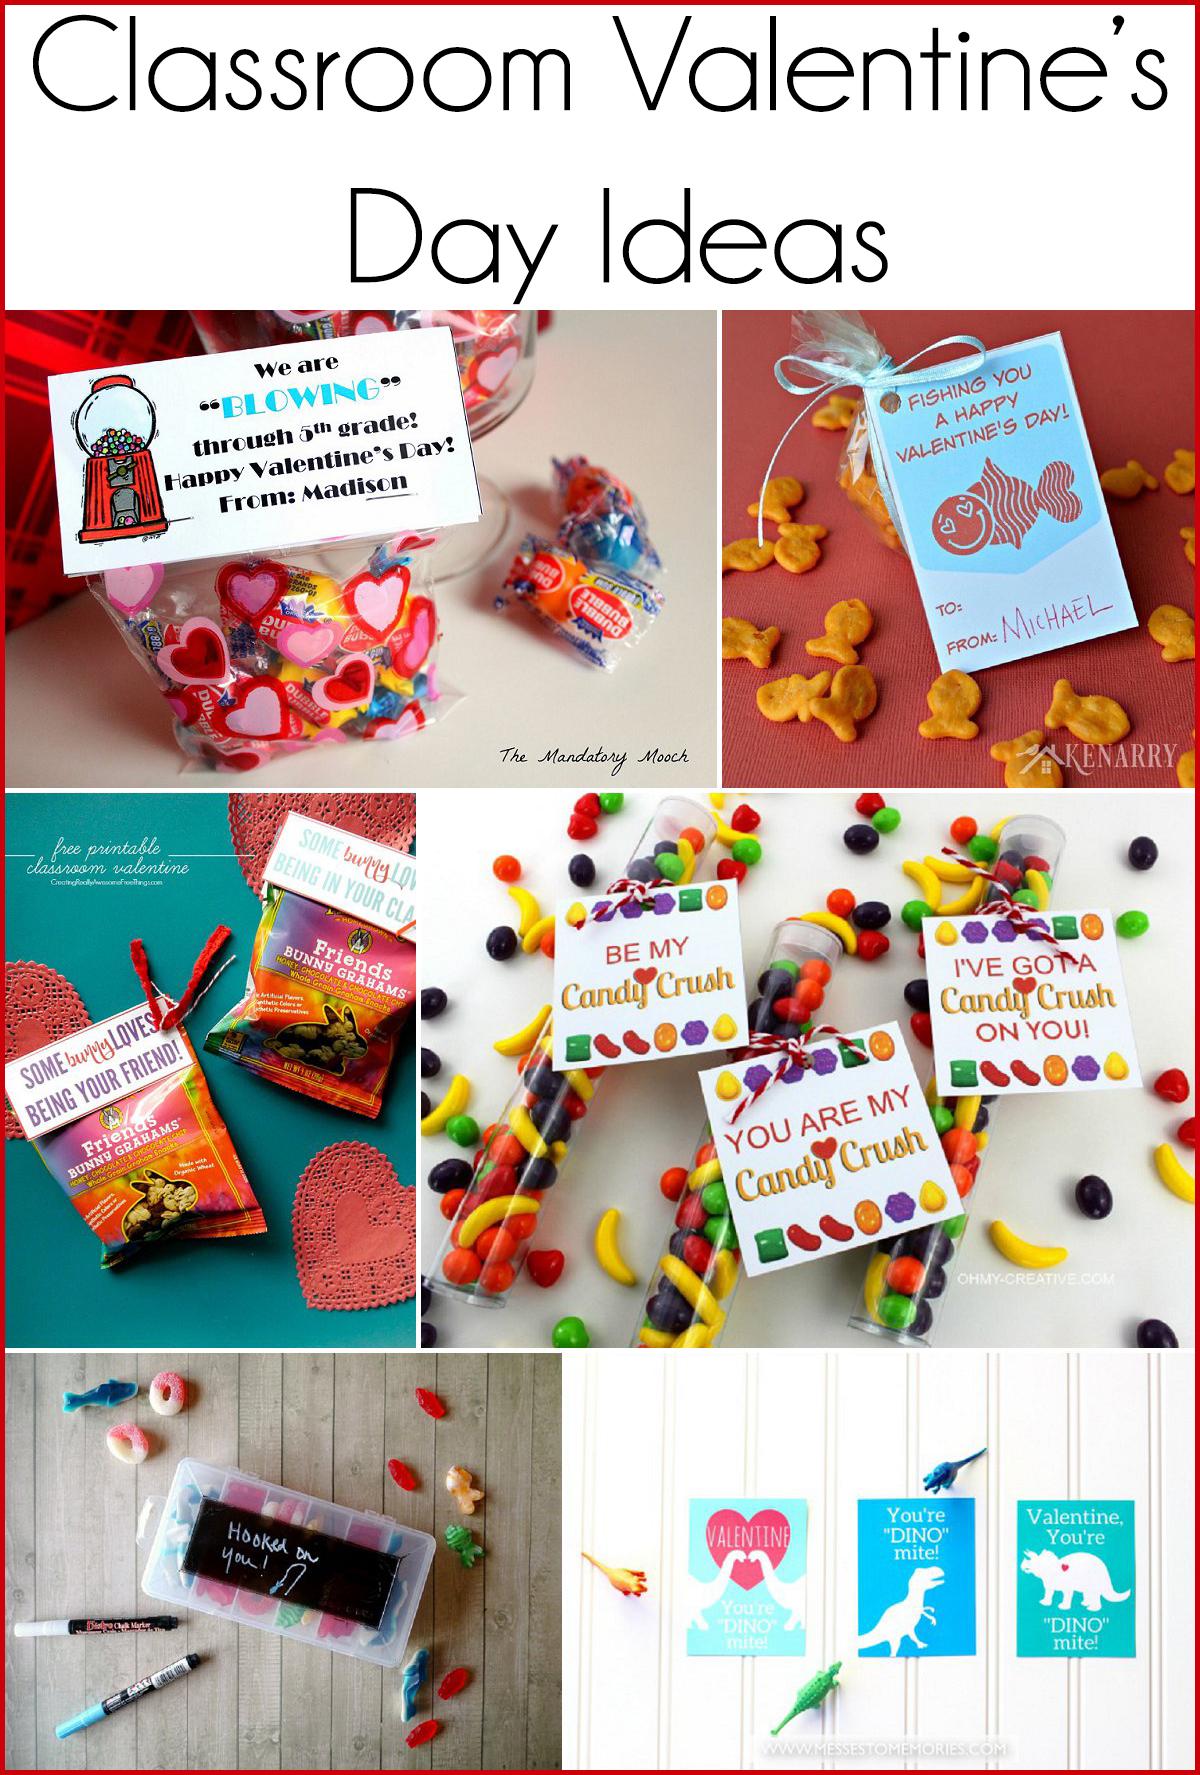 Classroom Ideas Tumblr : Classroom valentine s day ideas sarah halstead